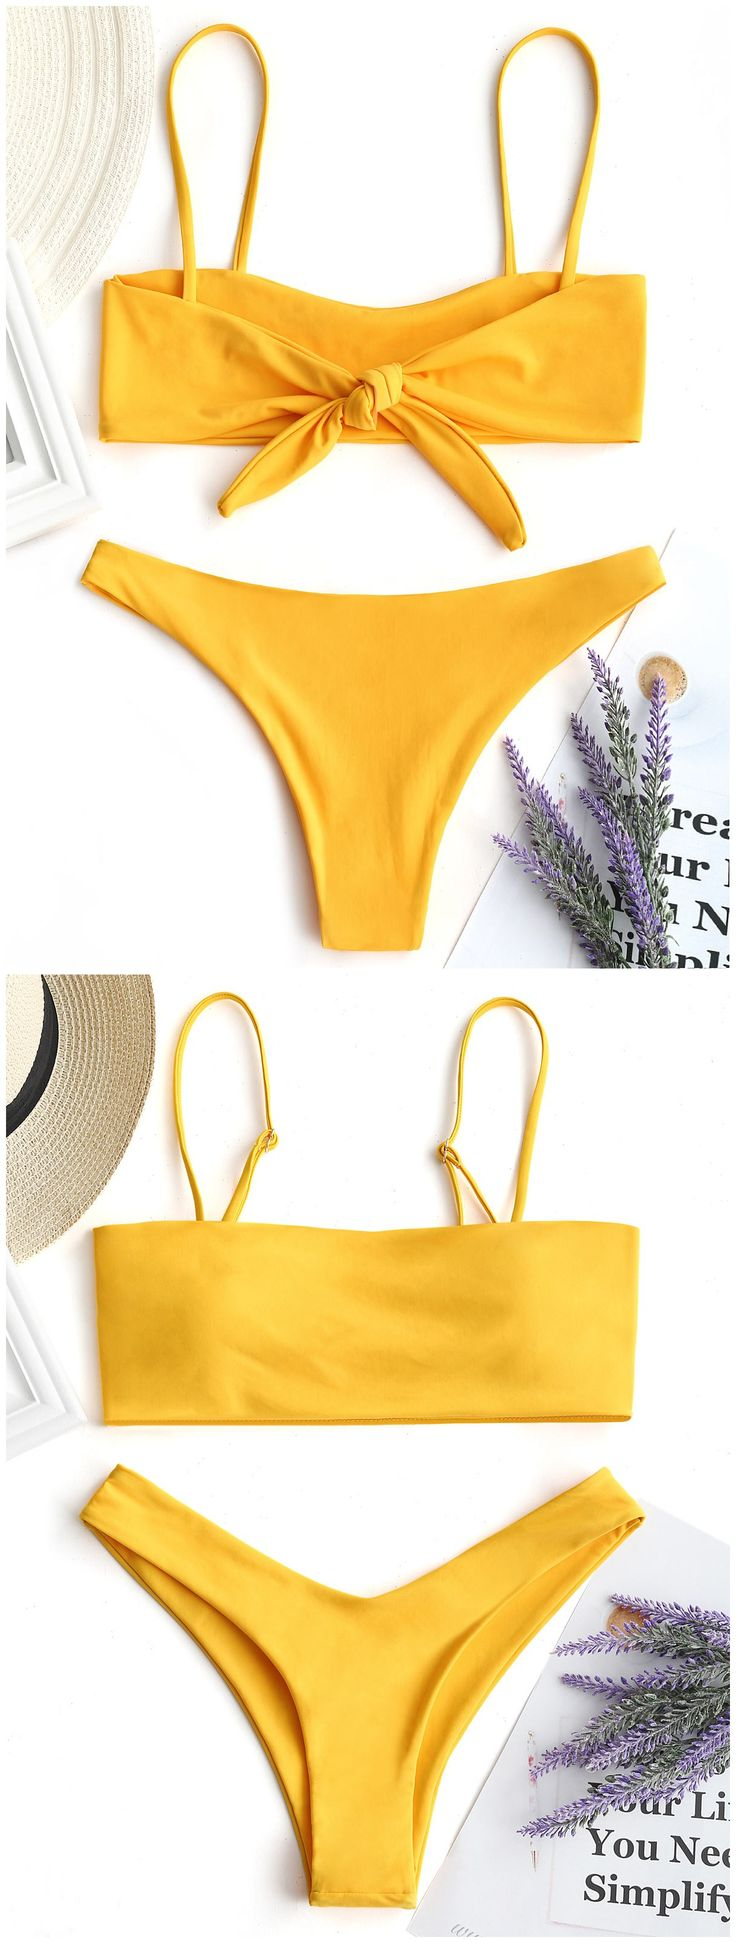 Up to 80% OFF! Tied Bralette Bikini Set. #Zaful #Swimwear #Bikinis zaful,zaful outfits,zaful dresses,spring outfits,summer dresses,Valentine's Day,valentines day ideas,cute,casual,fashion,style,bathing suit,swimsuits,one pieces,swimwear,bikini set,bikini,one piece swimwear,beach outfit,swimwear cover ups,high waisted swimsuit,tankini,high cut one piece swimsuit,high waisted swimsuit,swimwear modest,swimsuit modest,cover ups,swimsuit cover up @zaful Extra 10% OFF Code:ZF2017